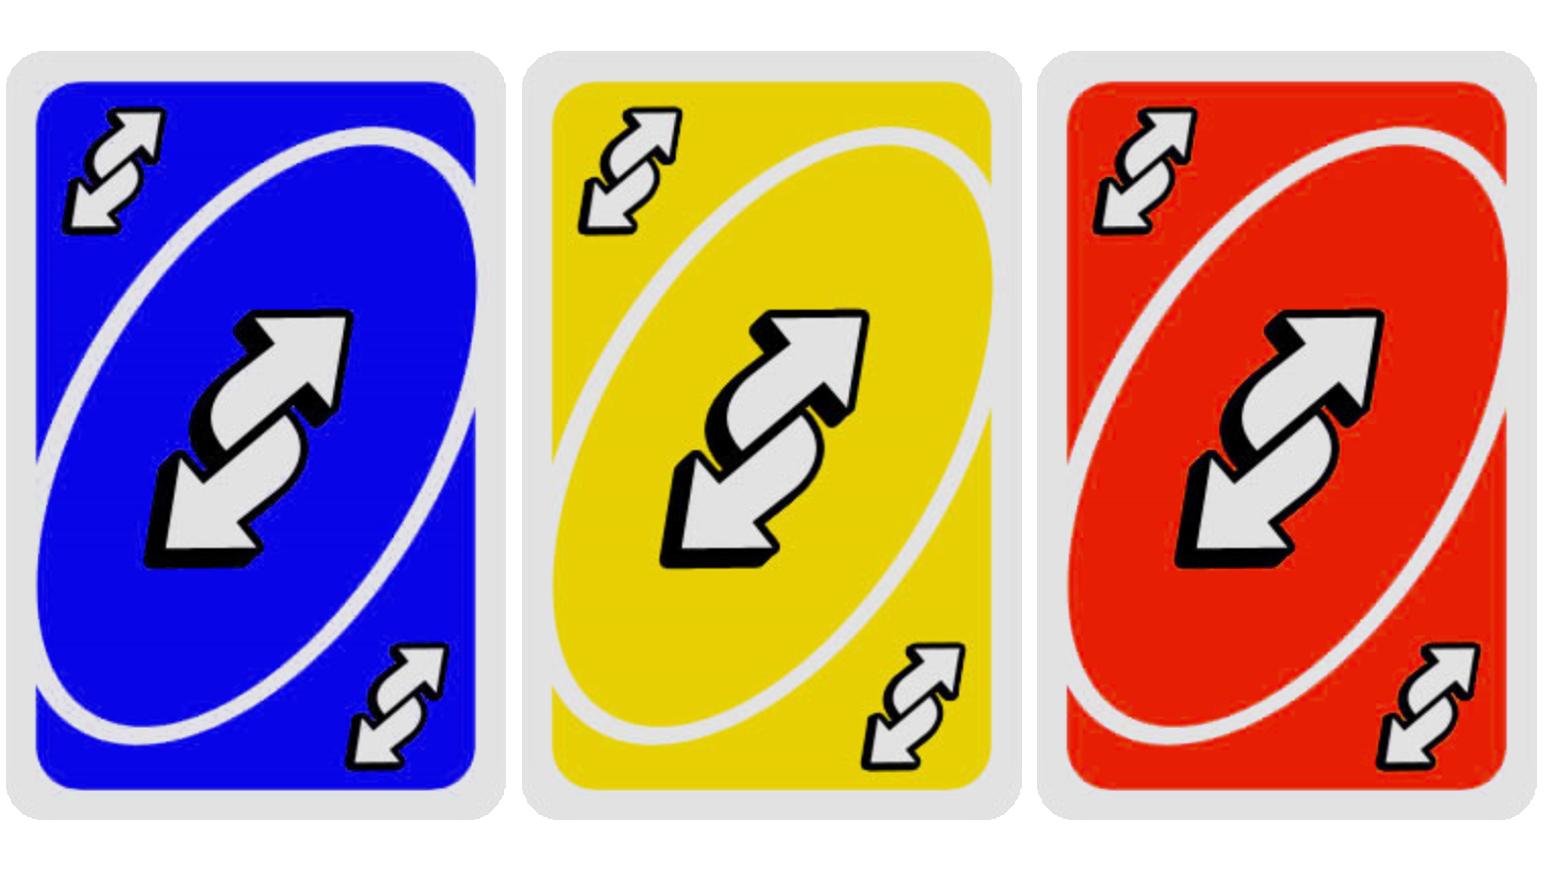 Télécharger photo uno reverse card png